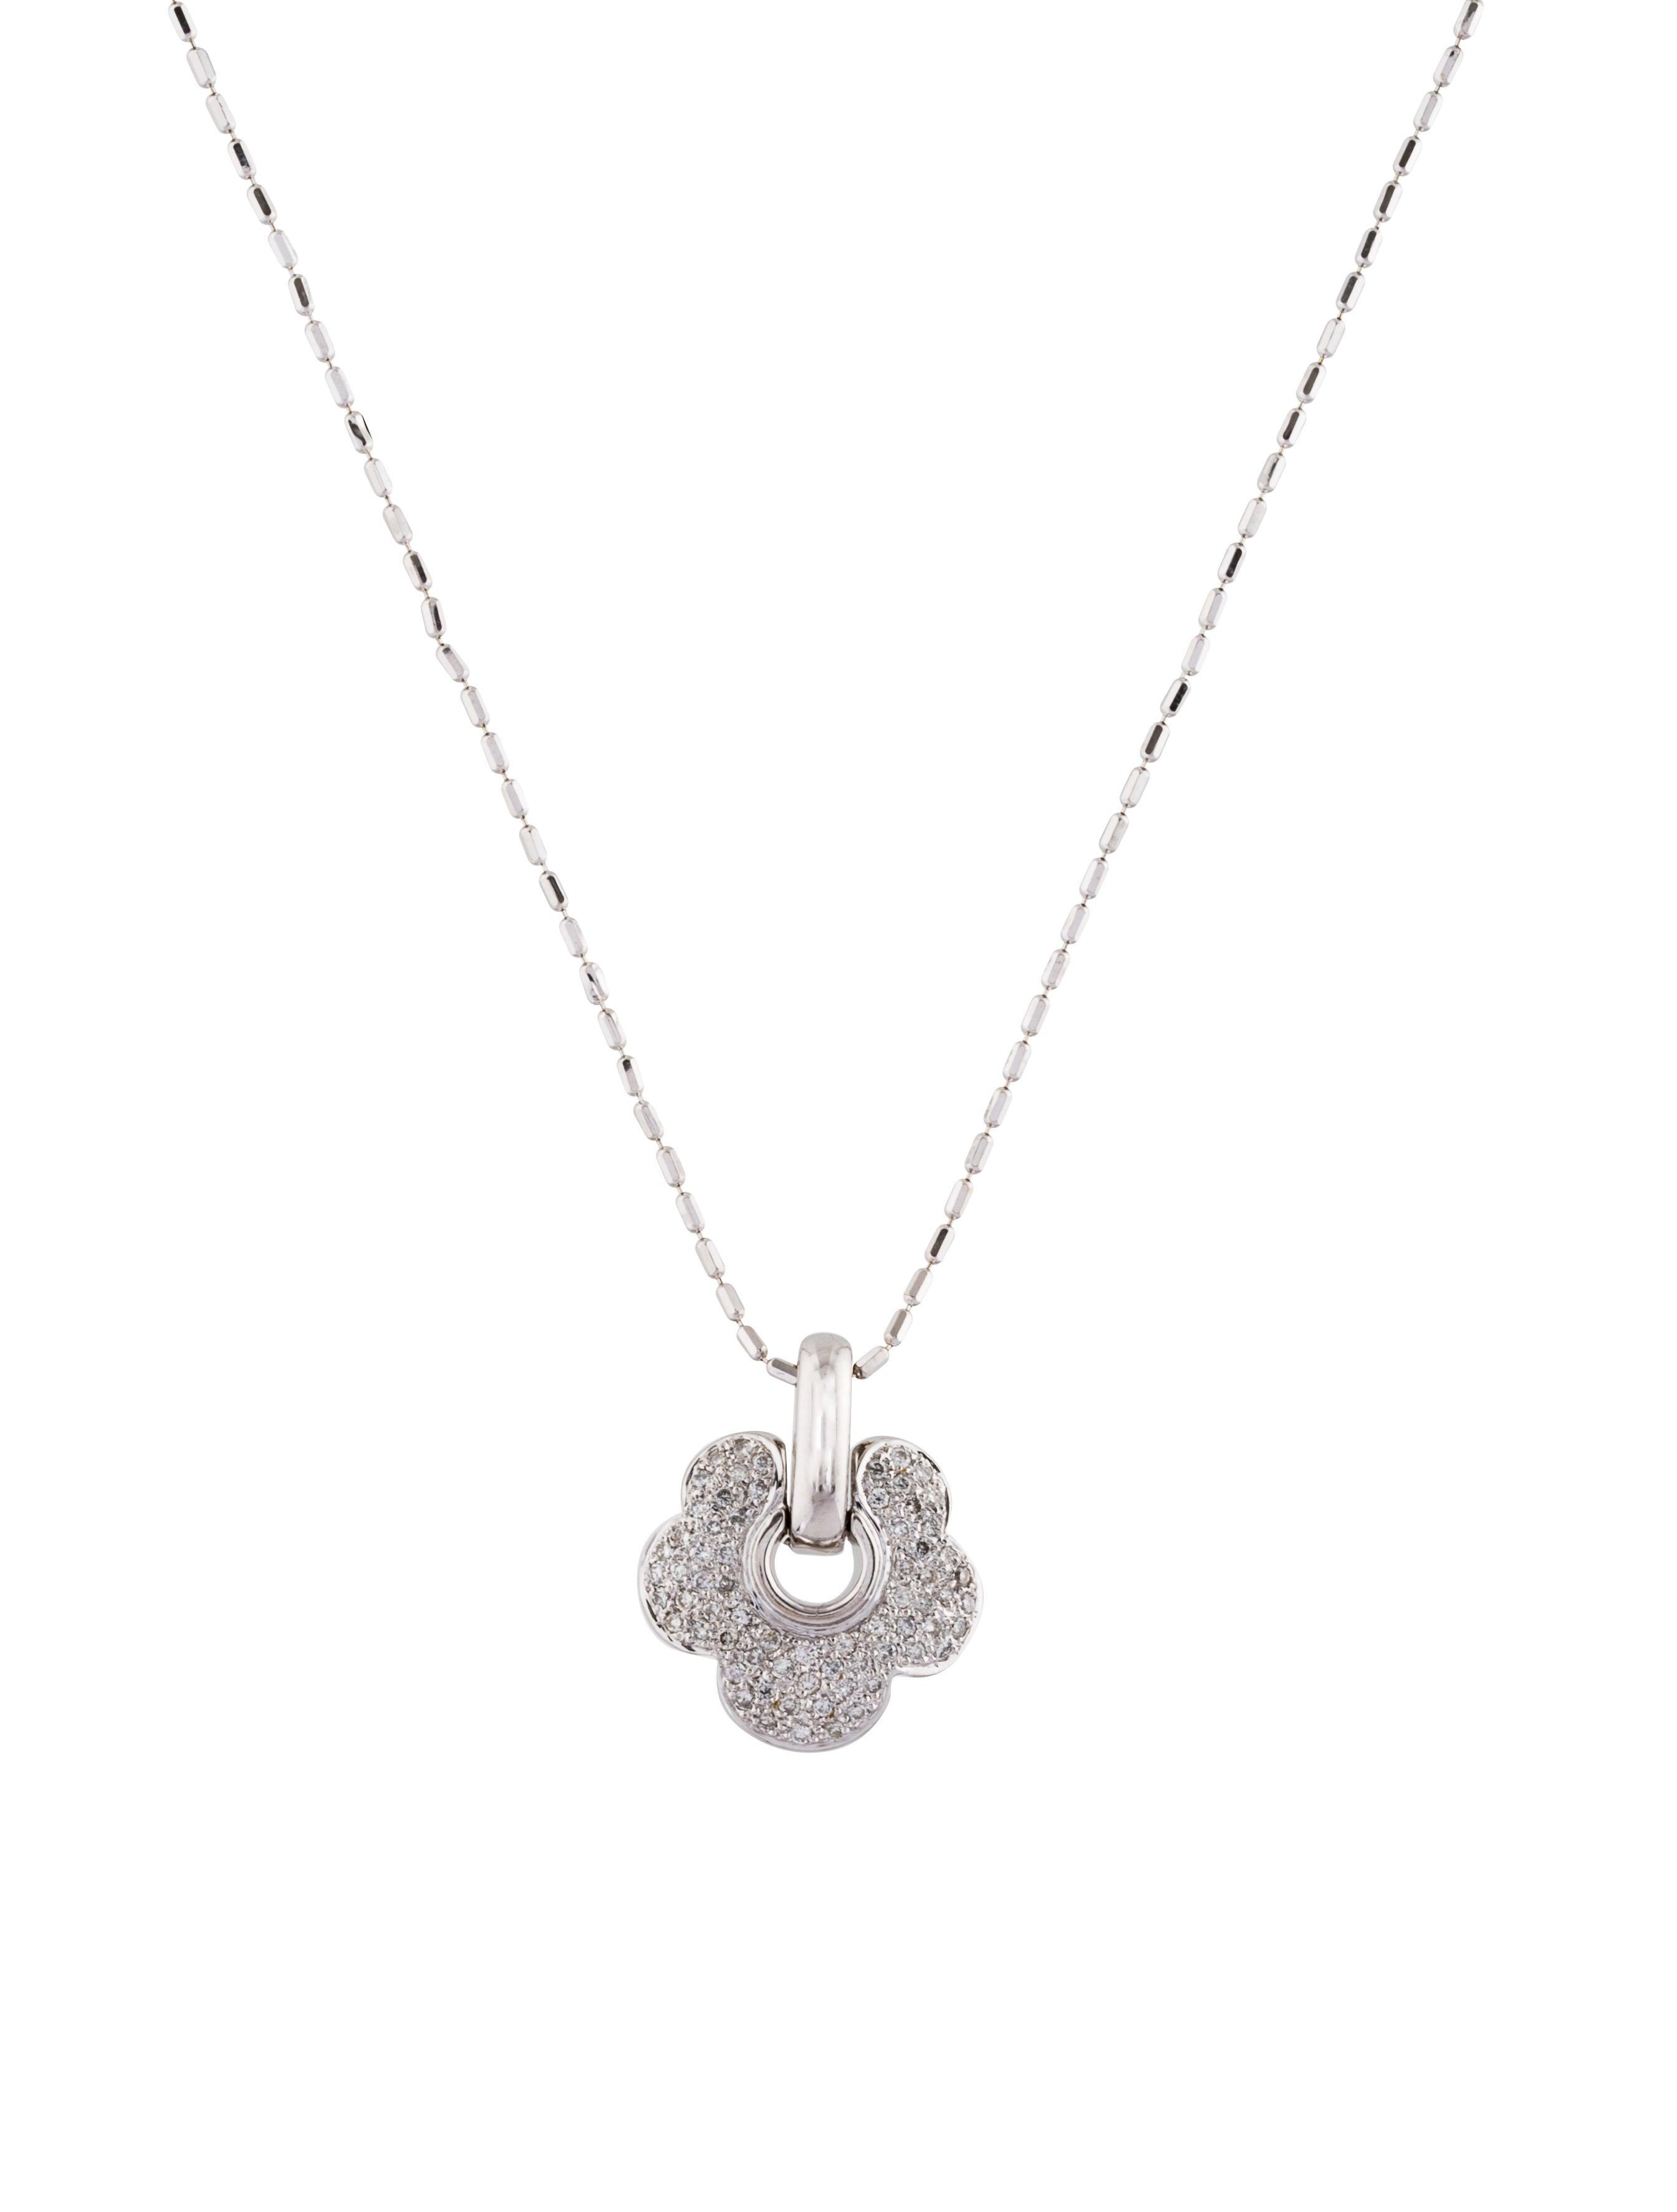 18k diamond flower pendant necklace necklaces neckl36822 the 18k diamond flower pendant necklace aloadofball Gallery